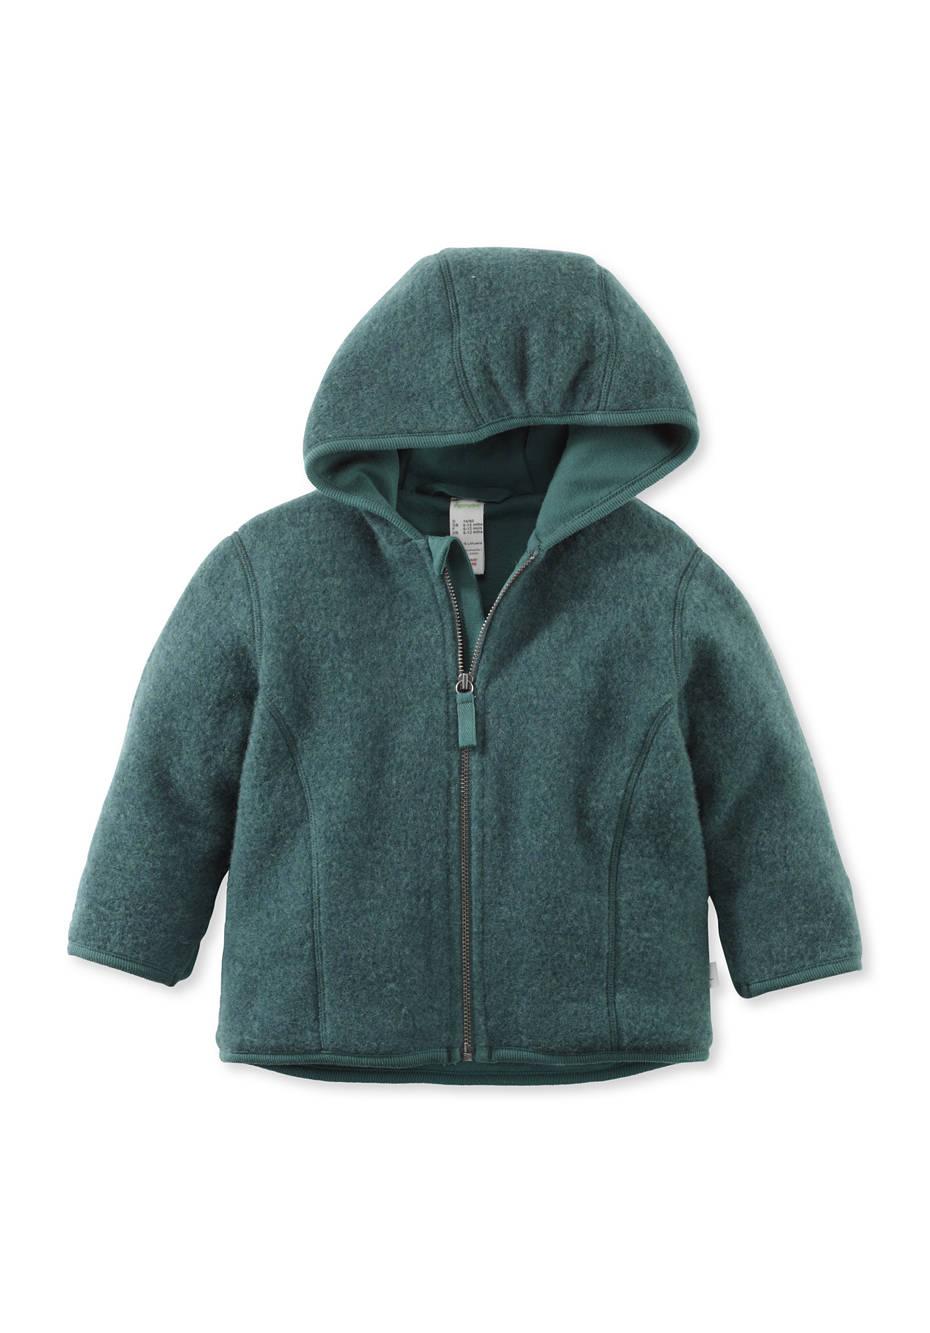 Wollfleece Jacke aus reiner Bio-Merinowolle